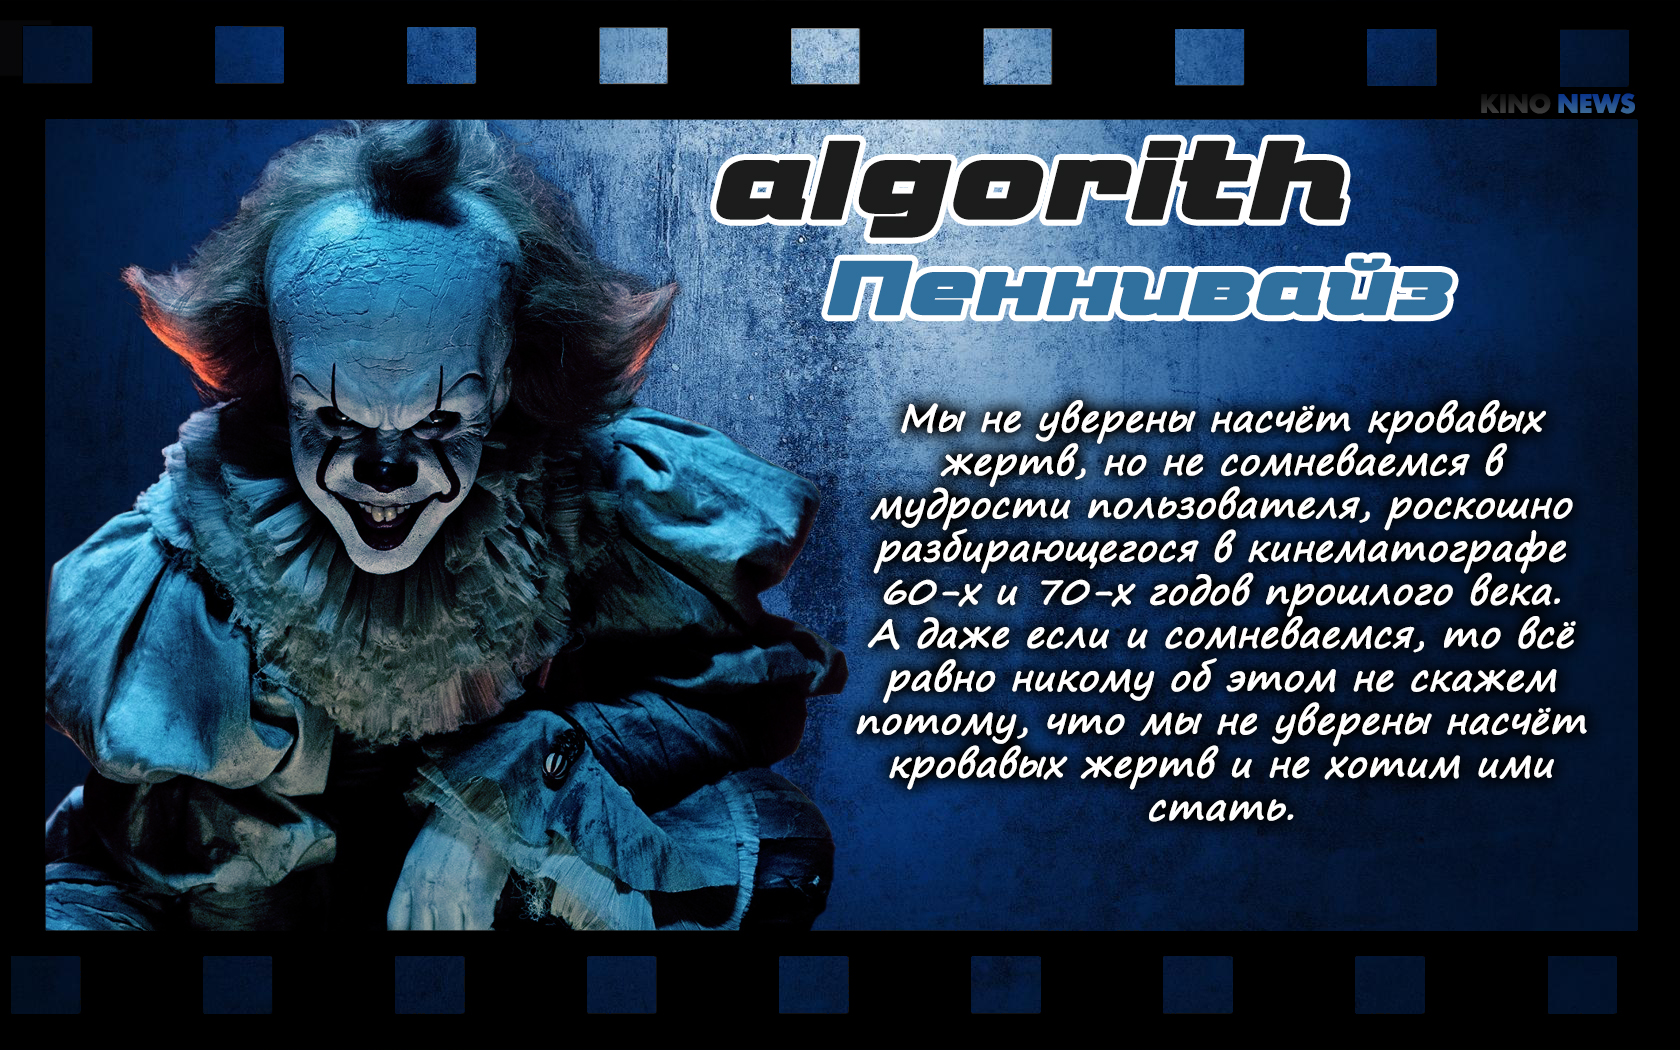 https://www.kinonews.ru/insimgs/2017/persimg/persimg77944_28.jpg